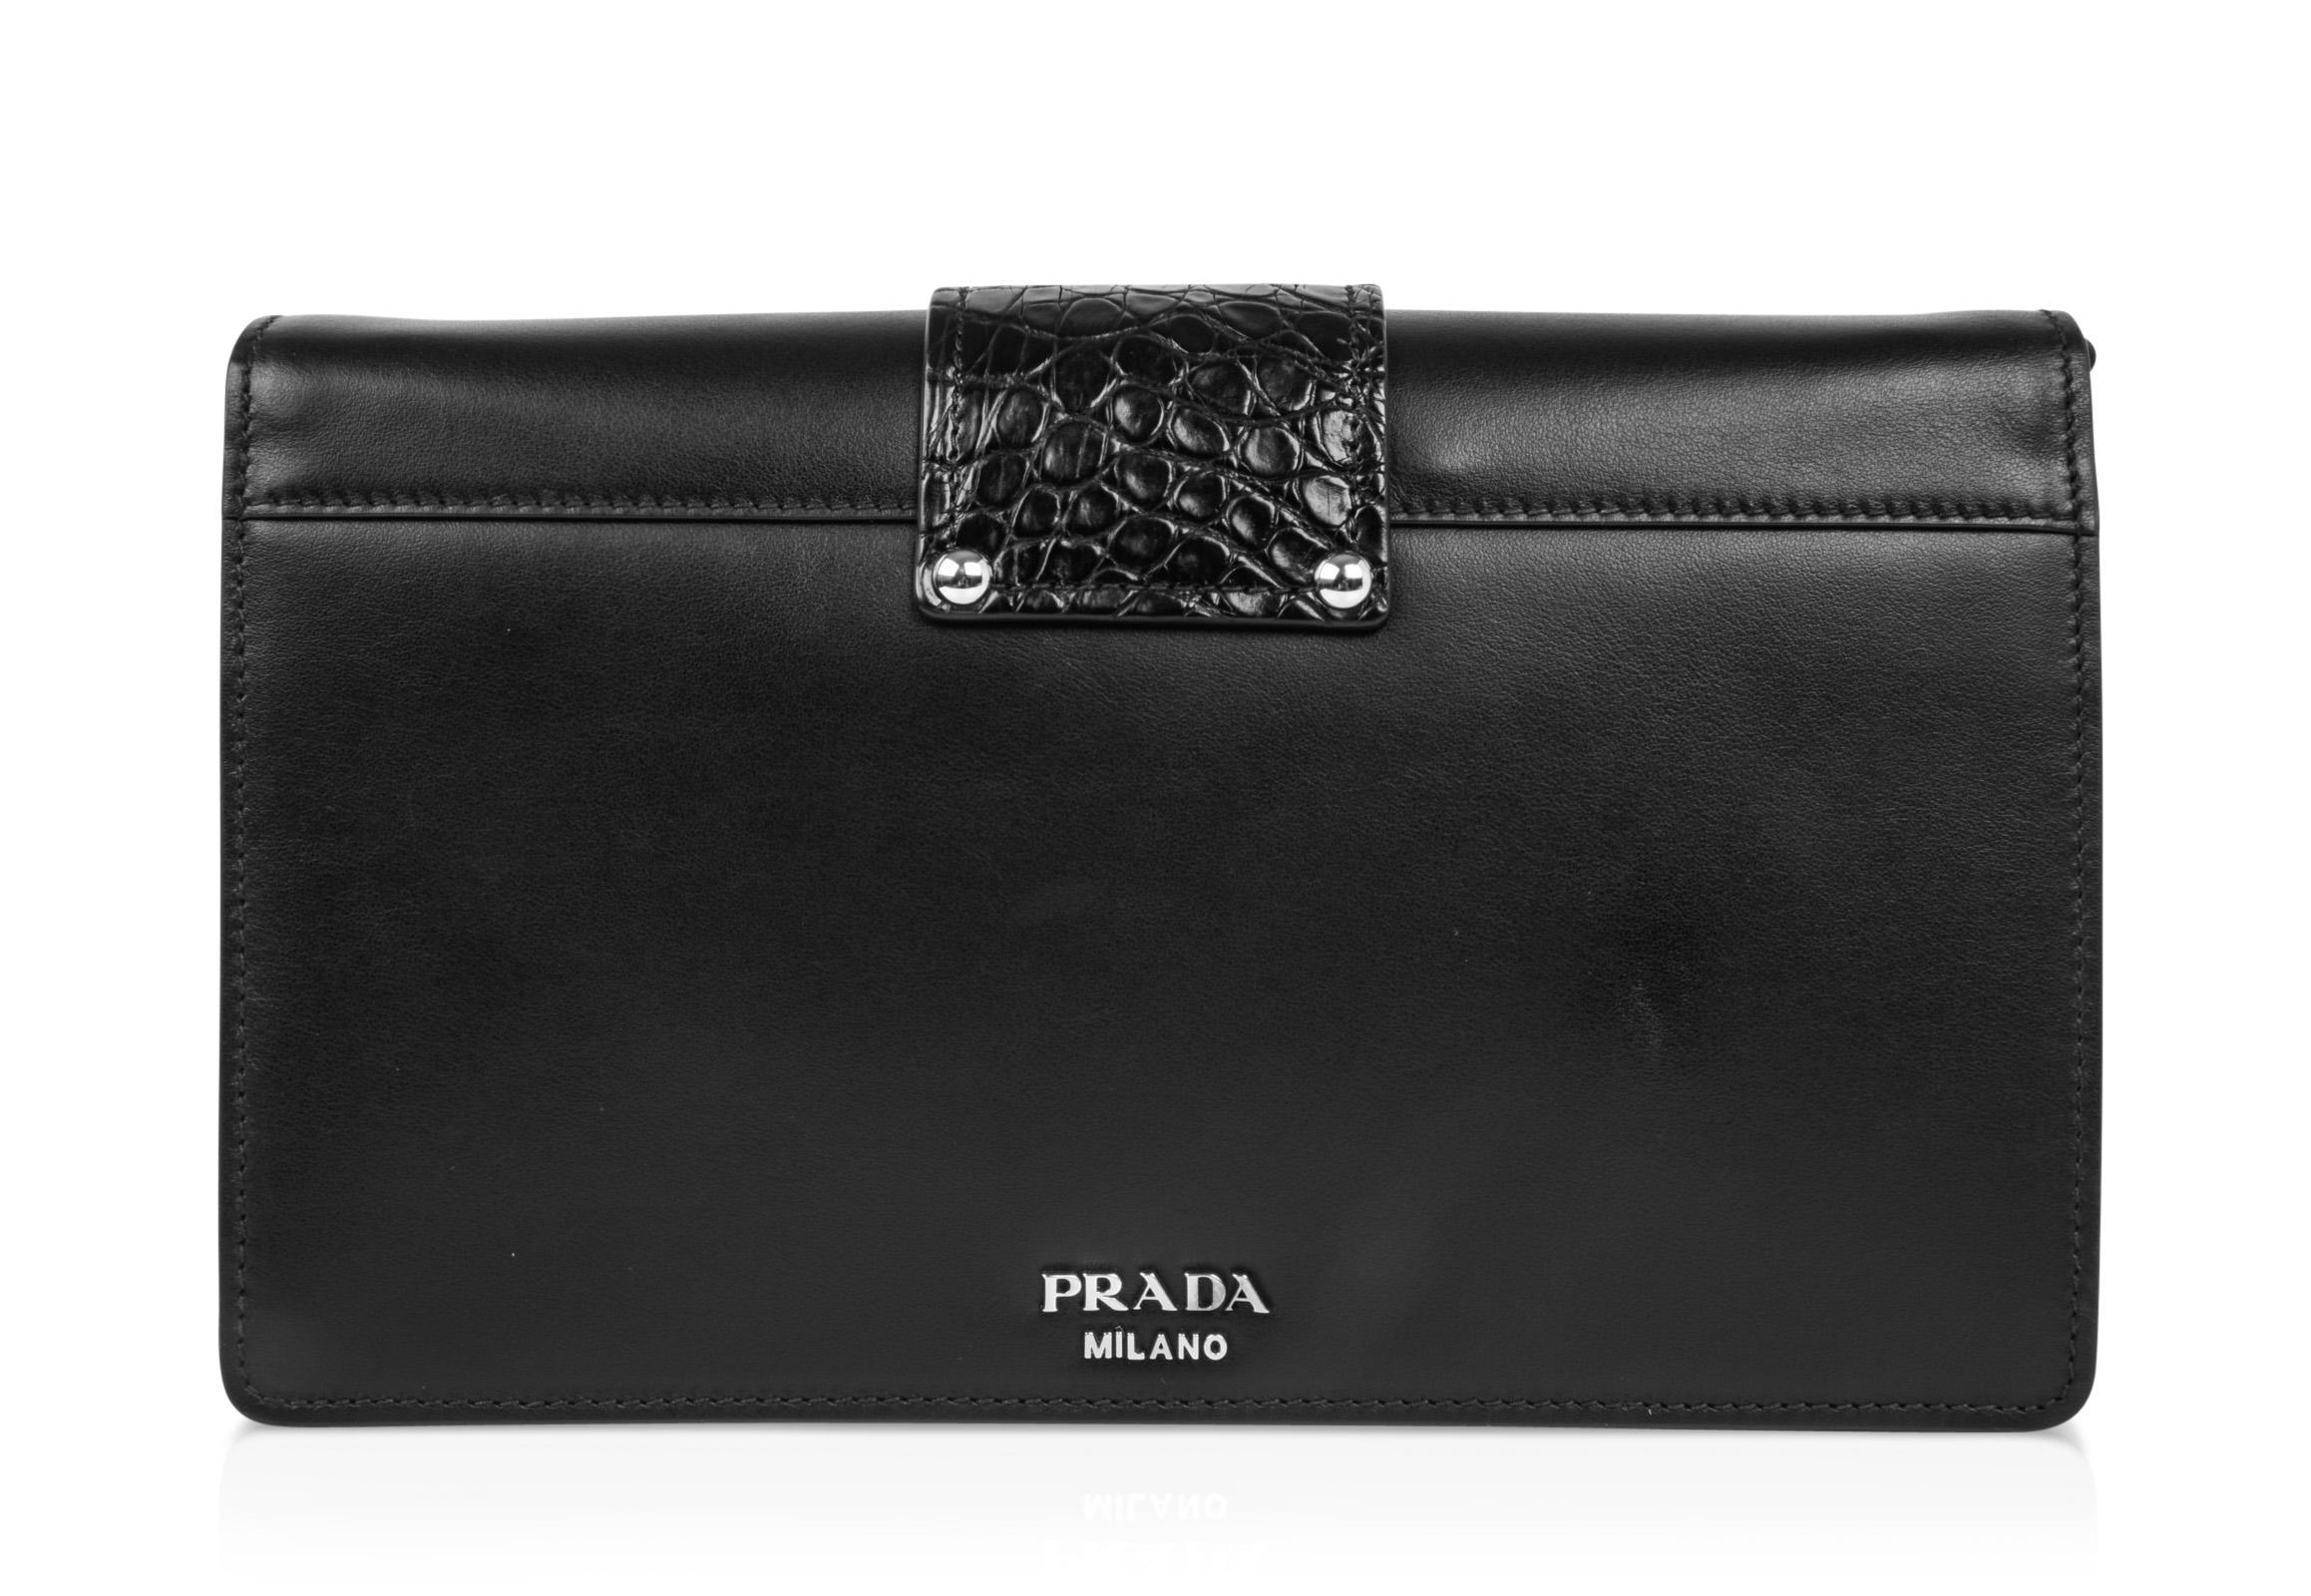 107632c8552 ... spain prada bag plex ribbon clutch shoulder black w crocodile and leather  ribbon for sale c9229